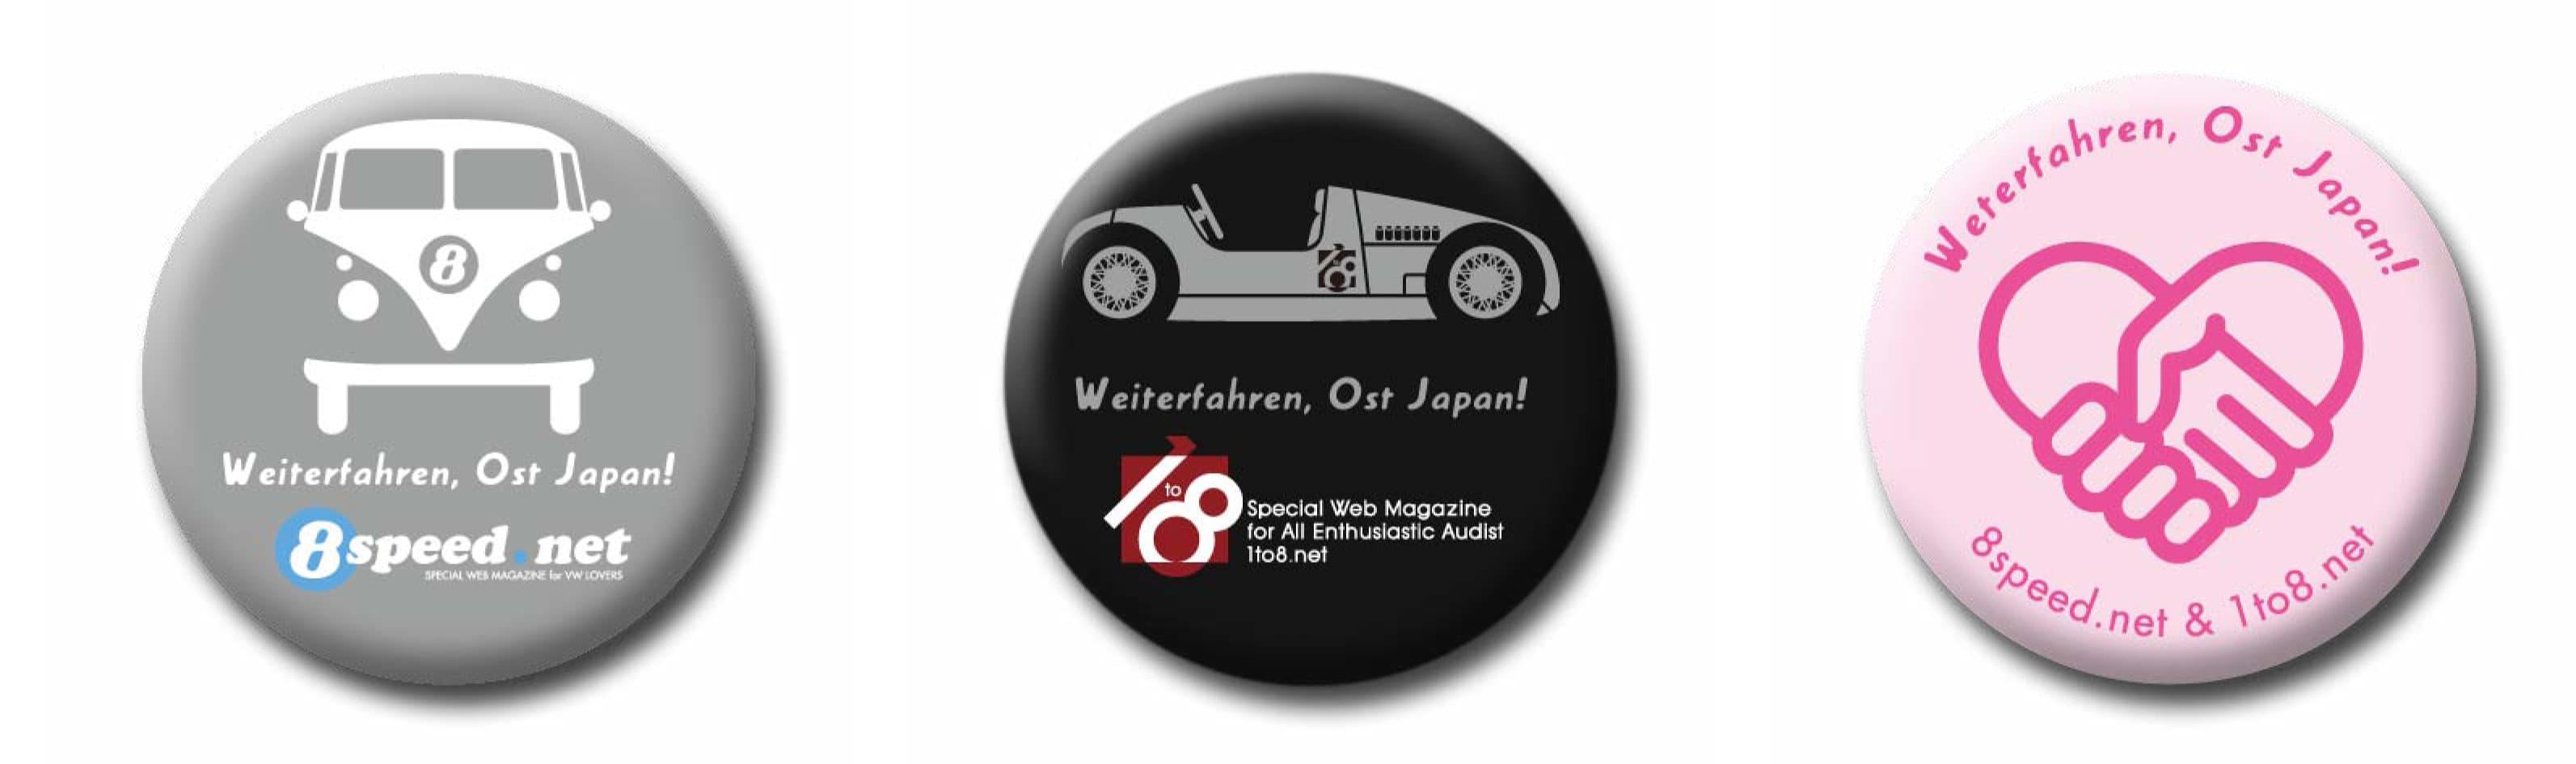 badge2012.jpg